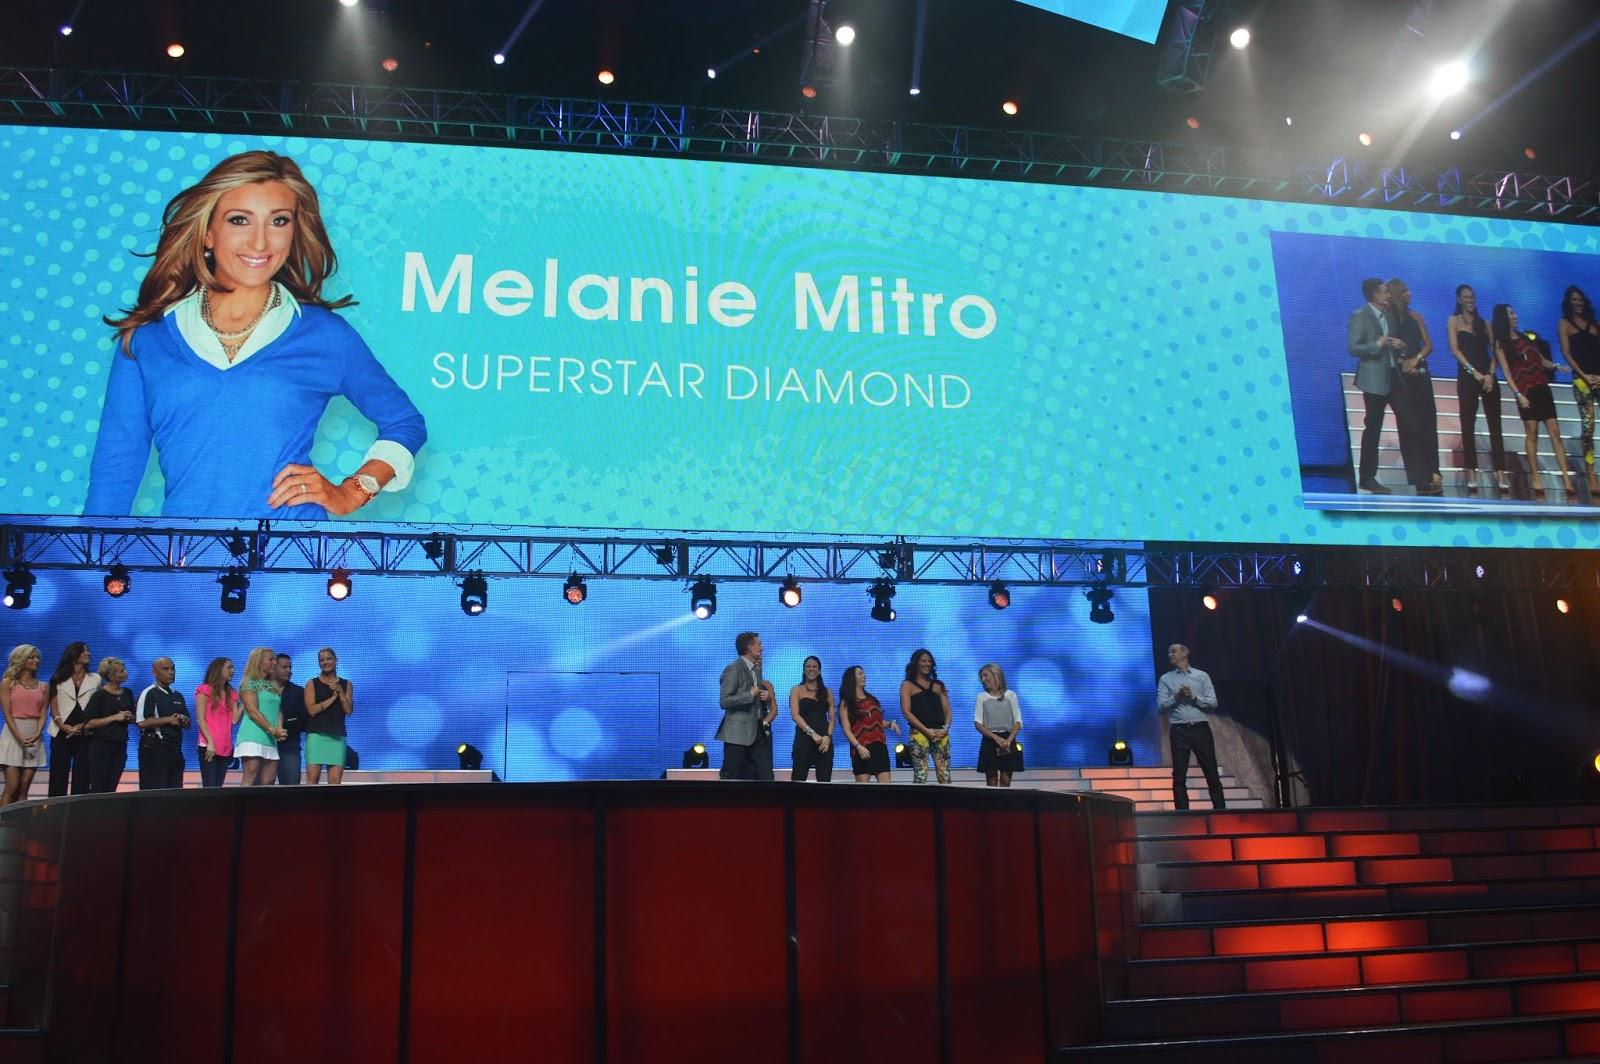 Super Star Diamond, Melanie Mitro, Team Beachbody Coach